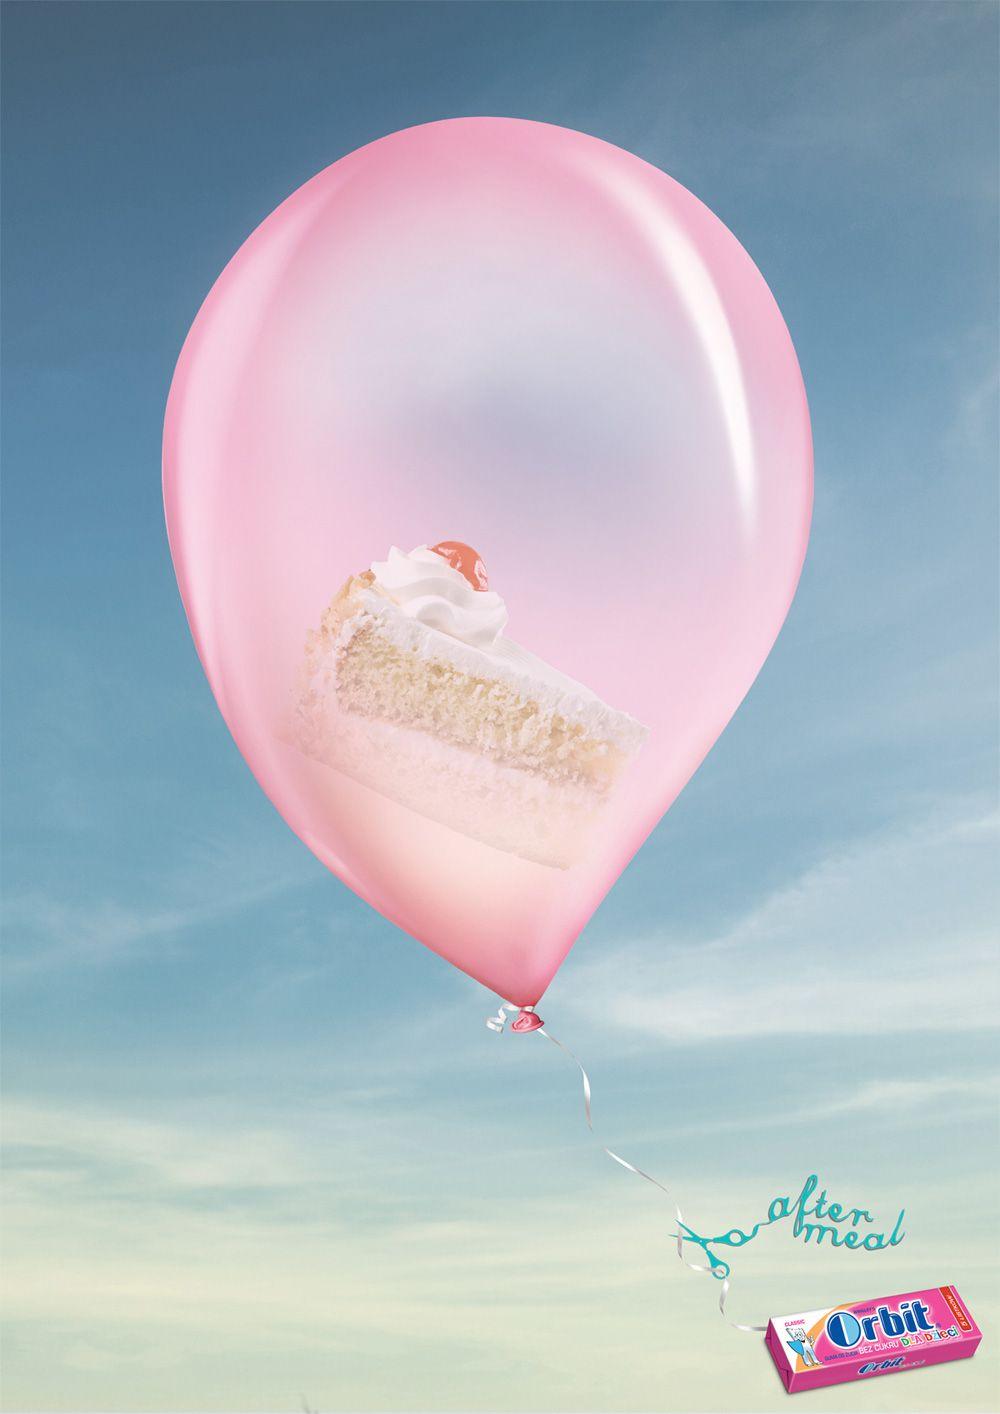 Orbit for kids - cake | #ads #marketing #creative #werbung #print #poster #advertising #campaign repinned by www.BlickeDeeler.de